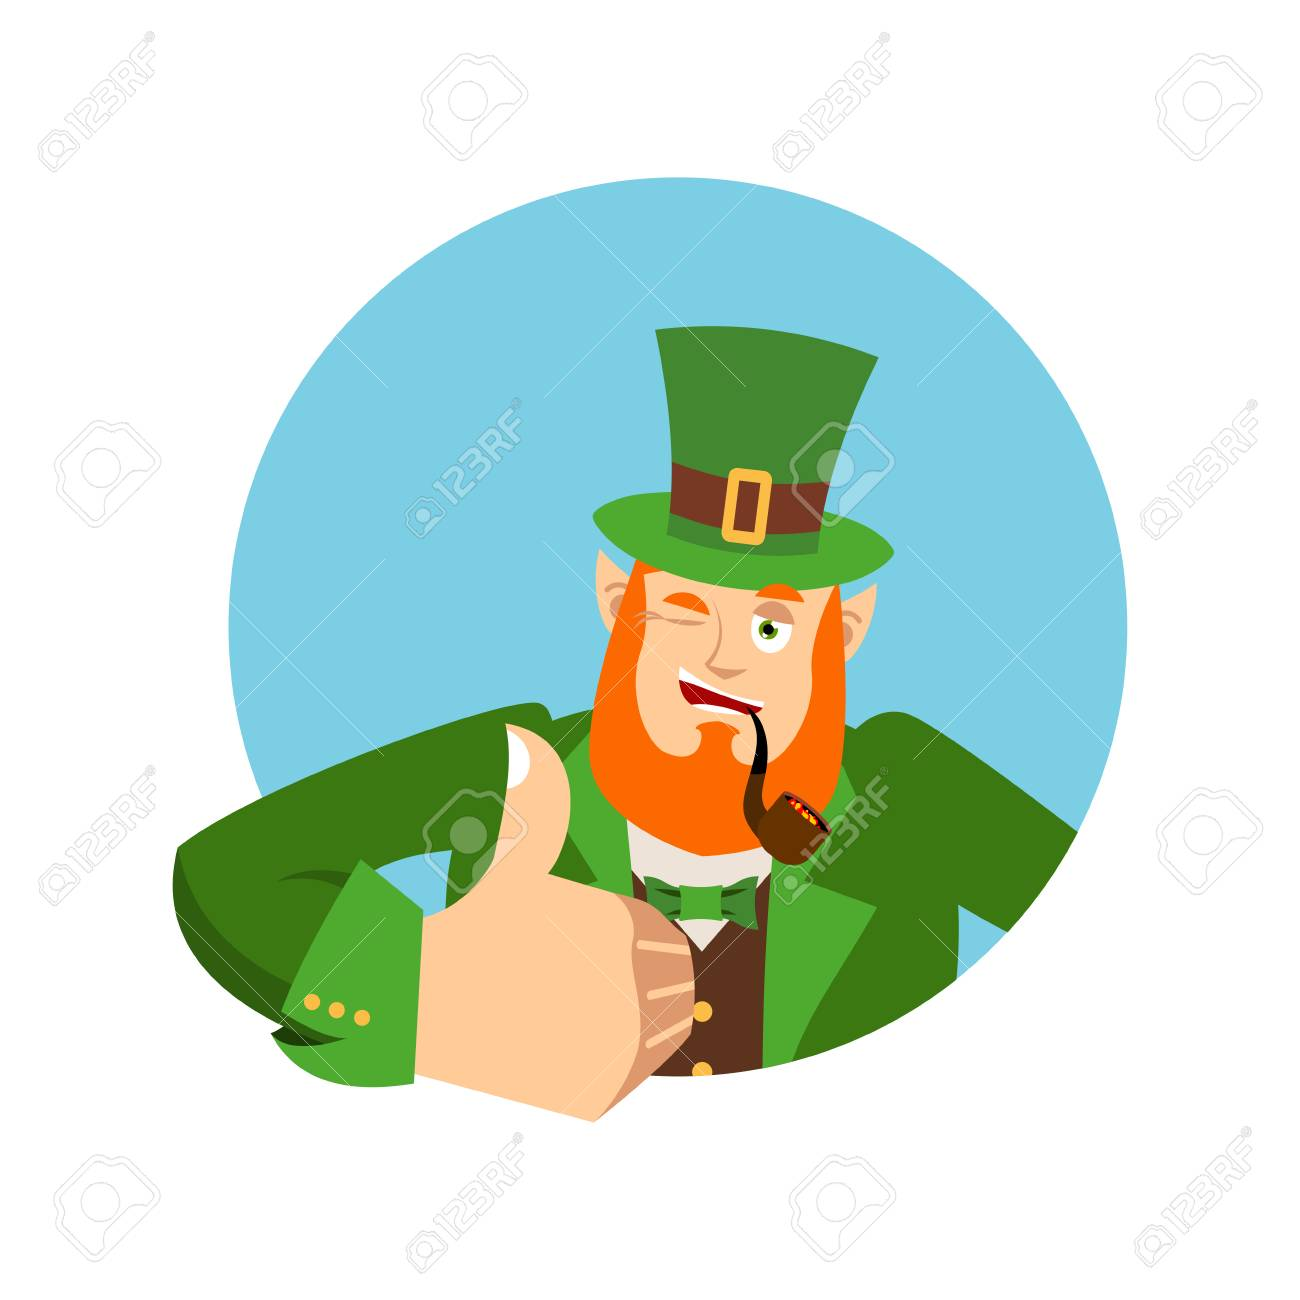 773ff1dc57c93 Irish elf emotions. Holiday in Ireland. Happy St.Patrick  s Day. Leprechaun  winks. Dwarf with red beard thumbs